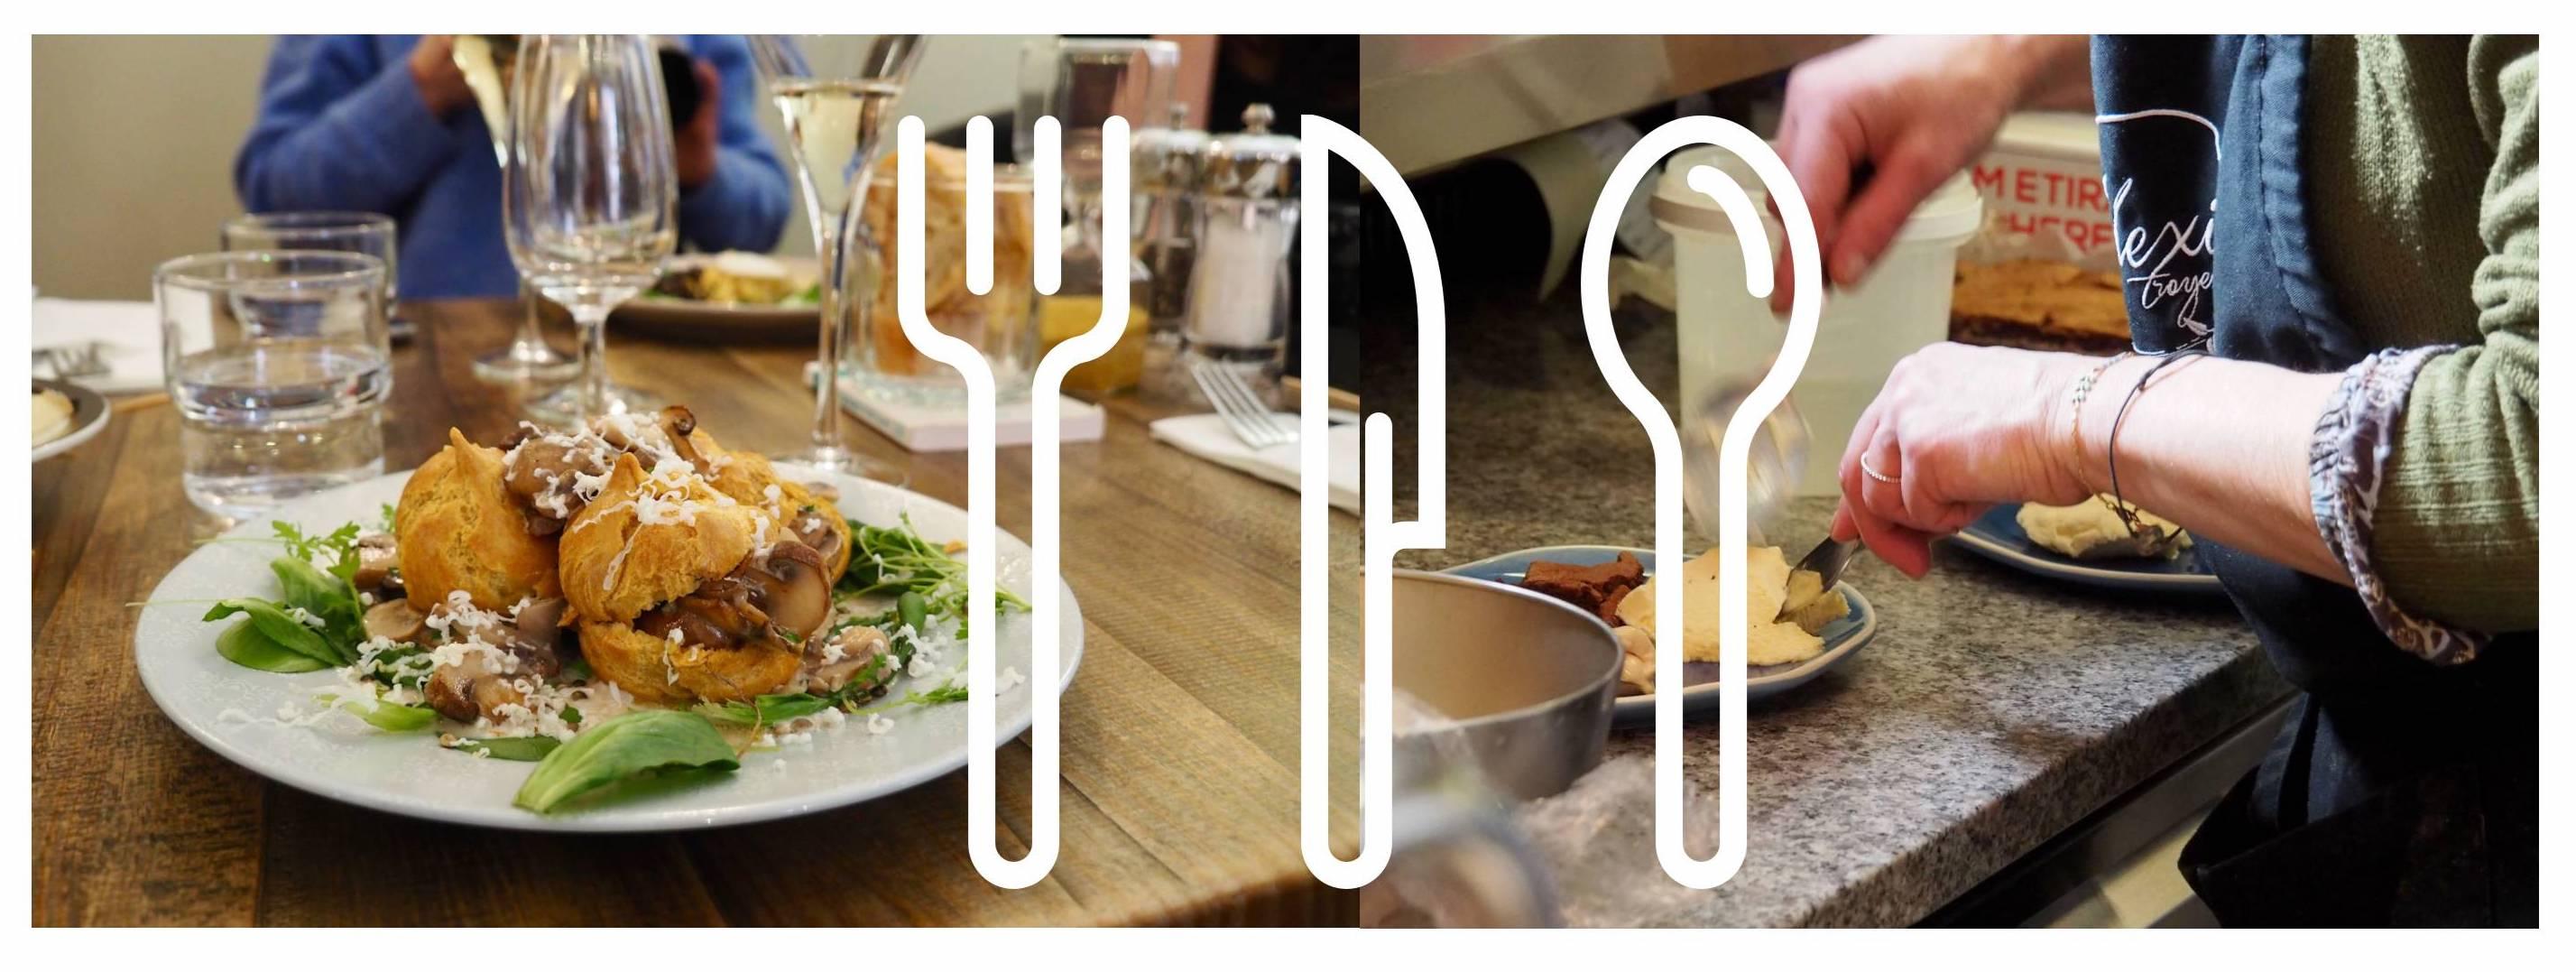 Week-end en Aube en Champagne - Restaurant Au Flexi Troyen à Troyes